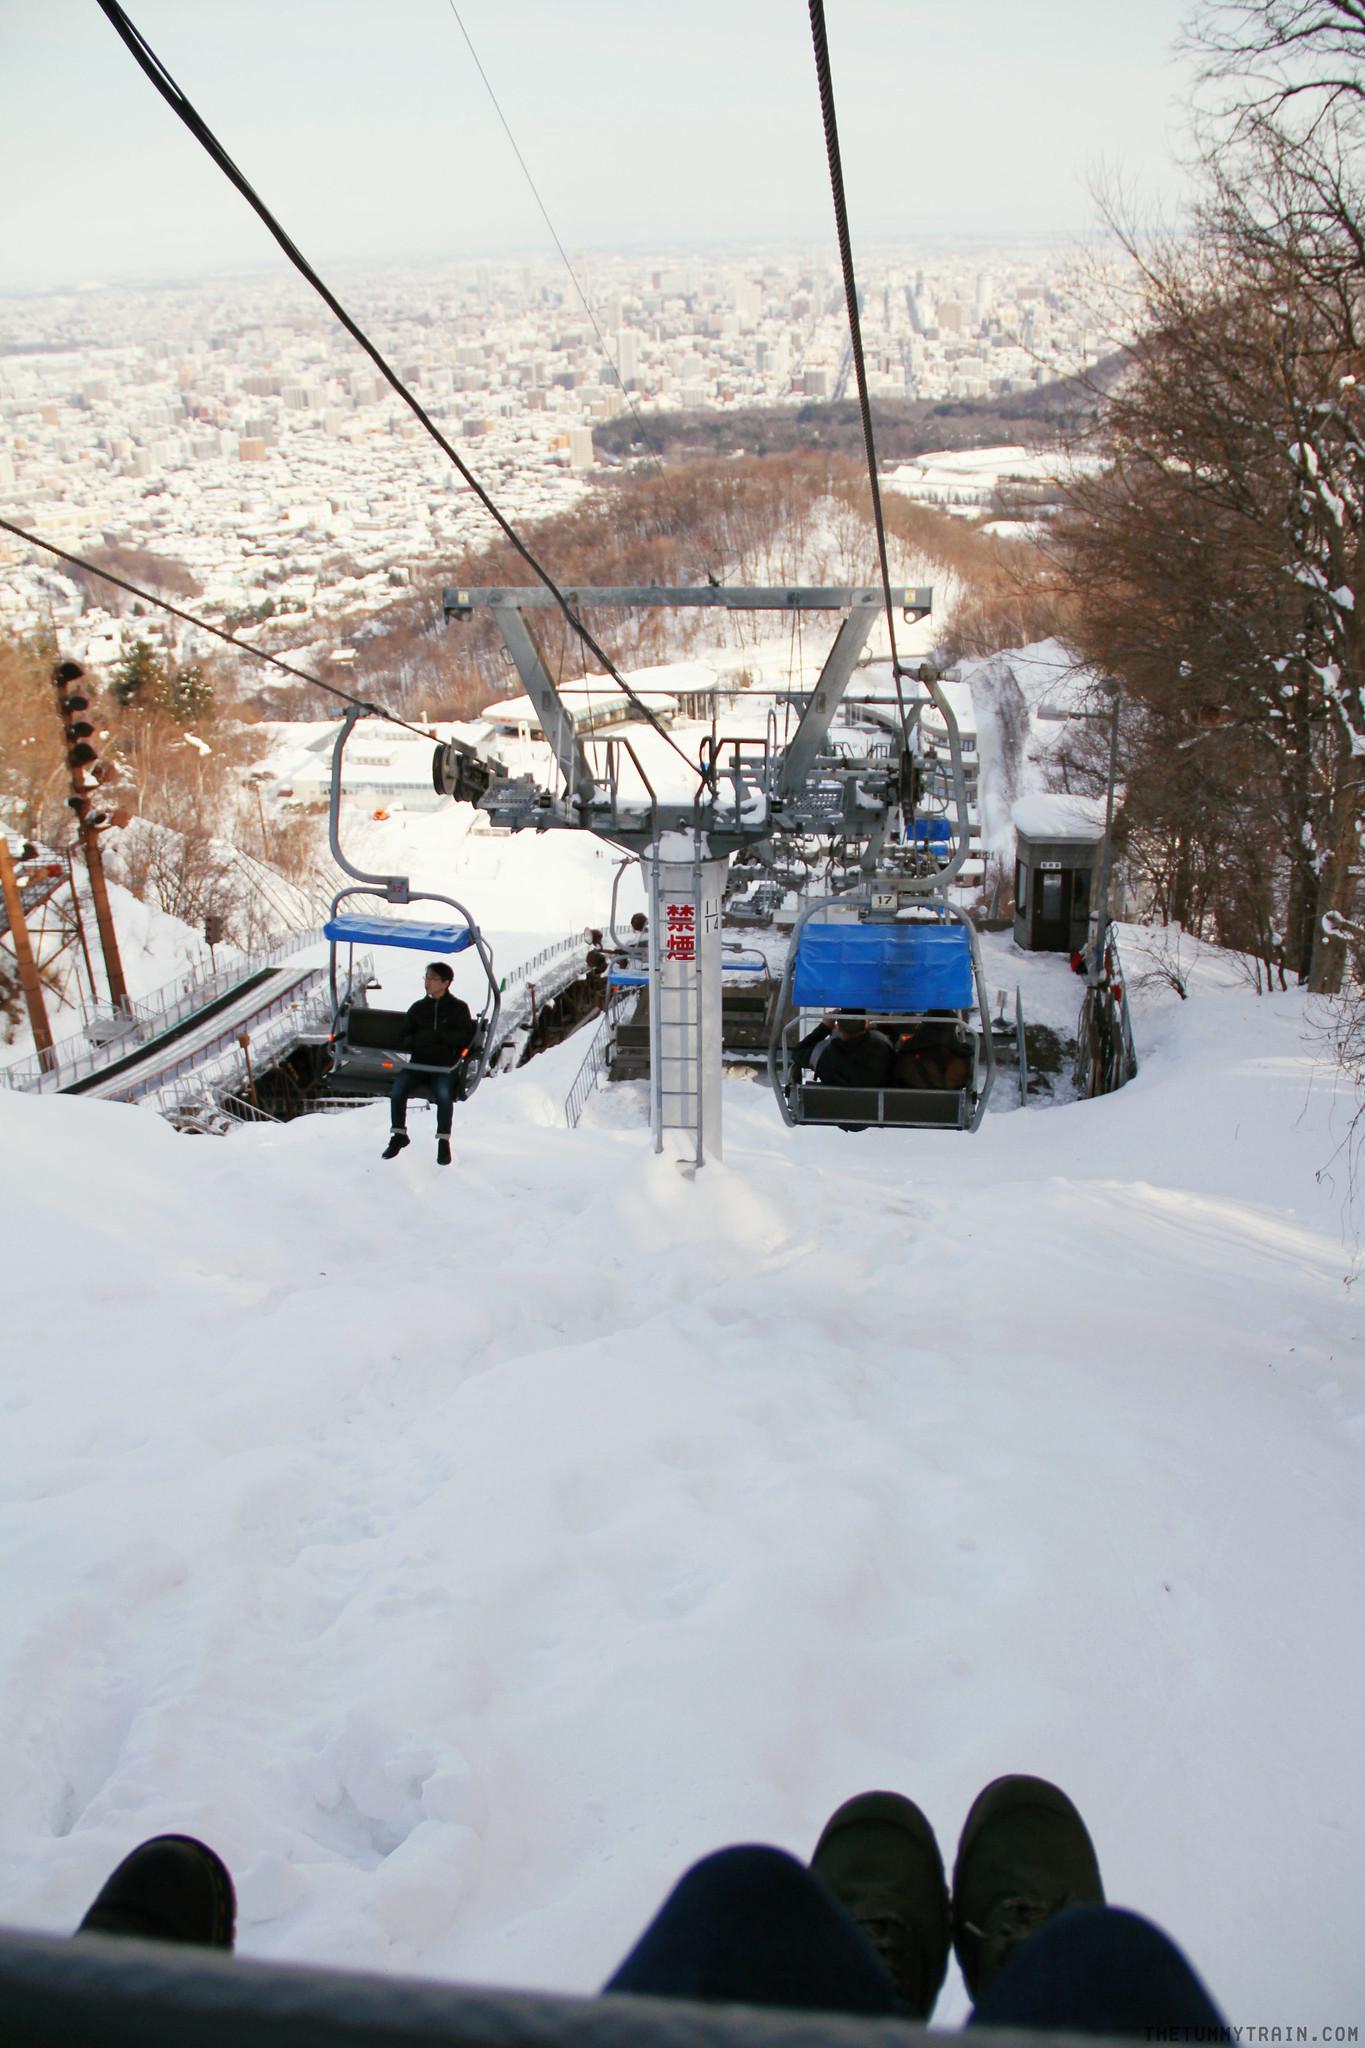 32073874704 e8e971e51b k - Sapporo Travel Diary 2017: Lifting off to the Okurayama Ski Jump Viewing Lounge